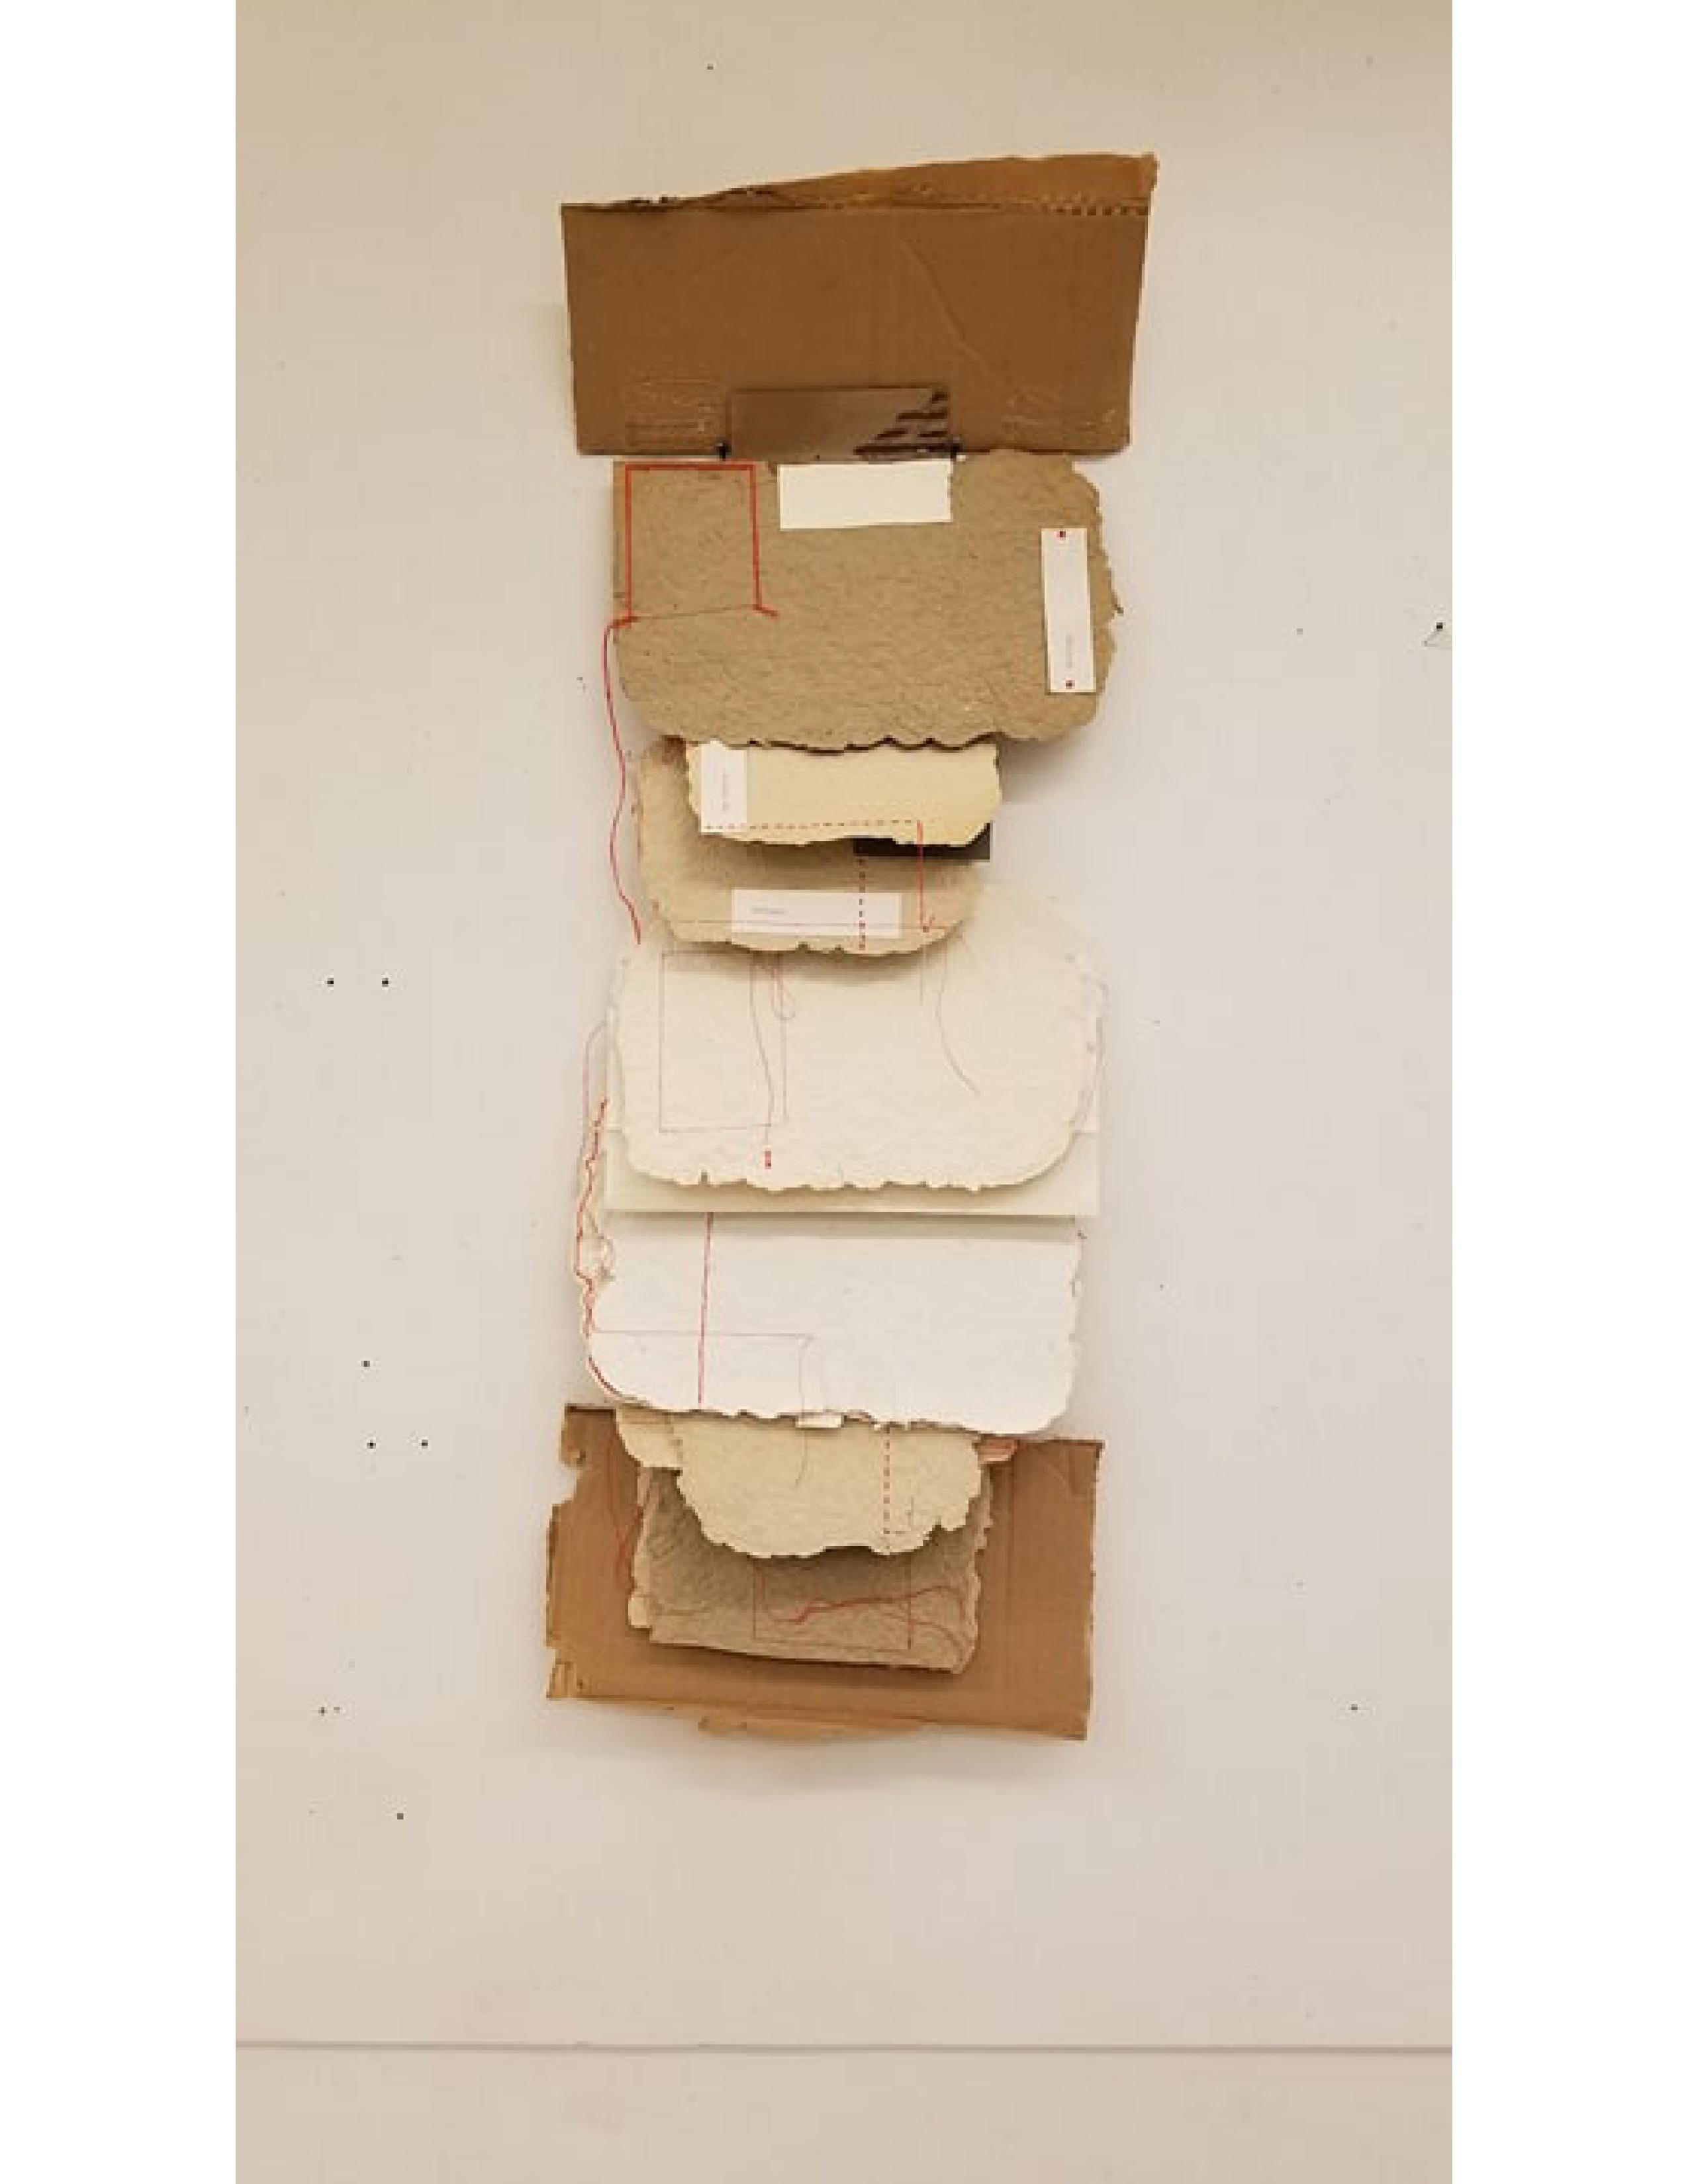 Danielle Heckman | Wilson Downtown Gallery